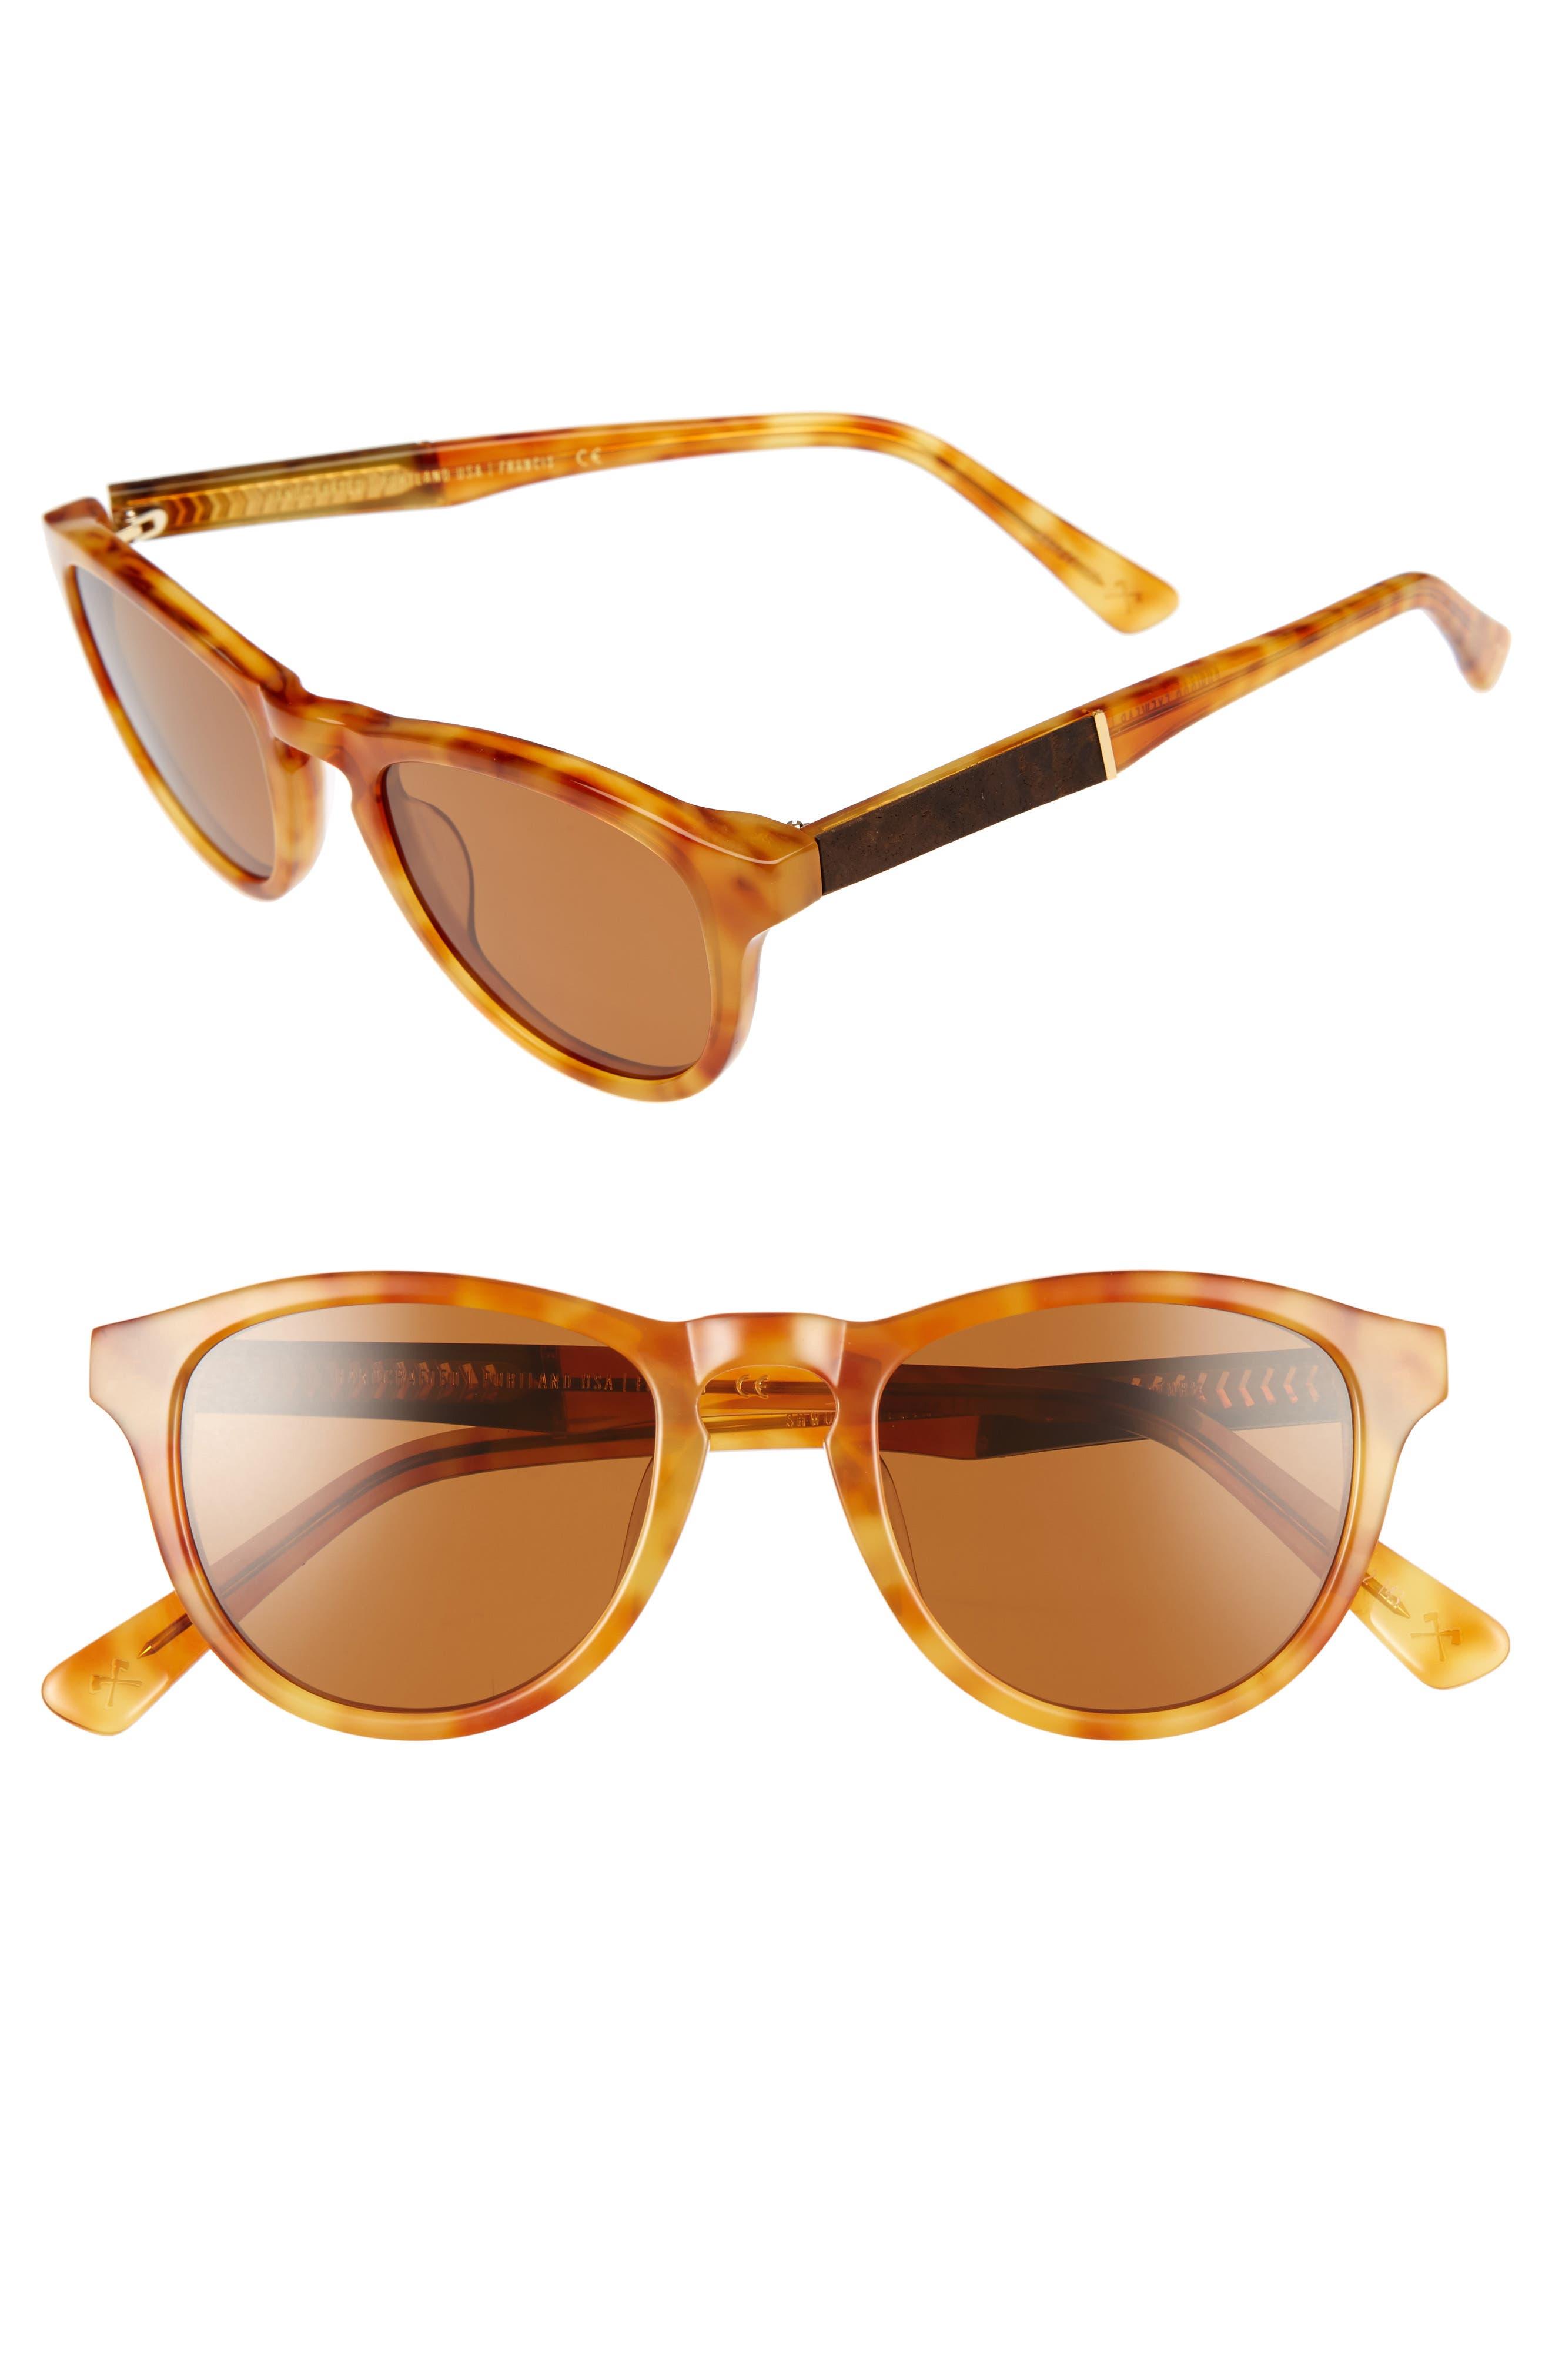 Ace 48mm Sunglasses,                             Main thumbnail 1, color,                             Amber/ Elm/ Brown Polar